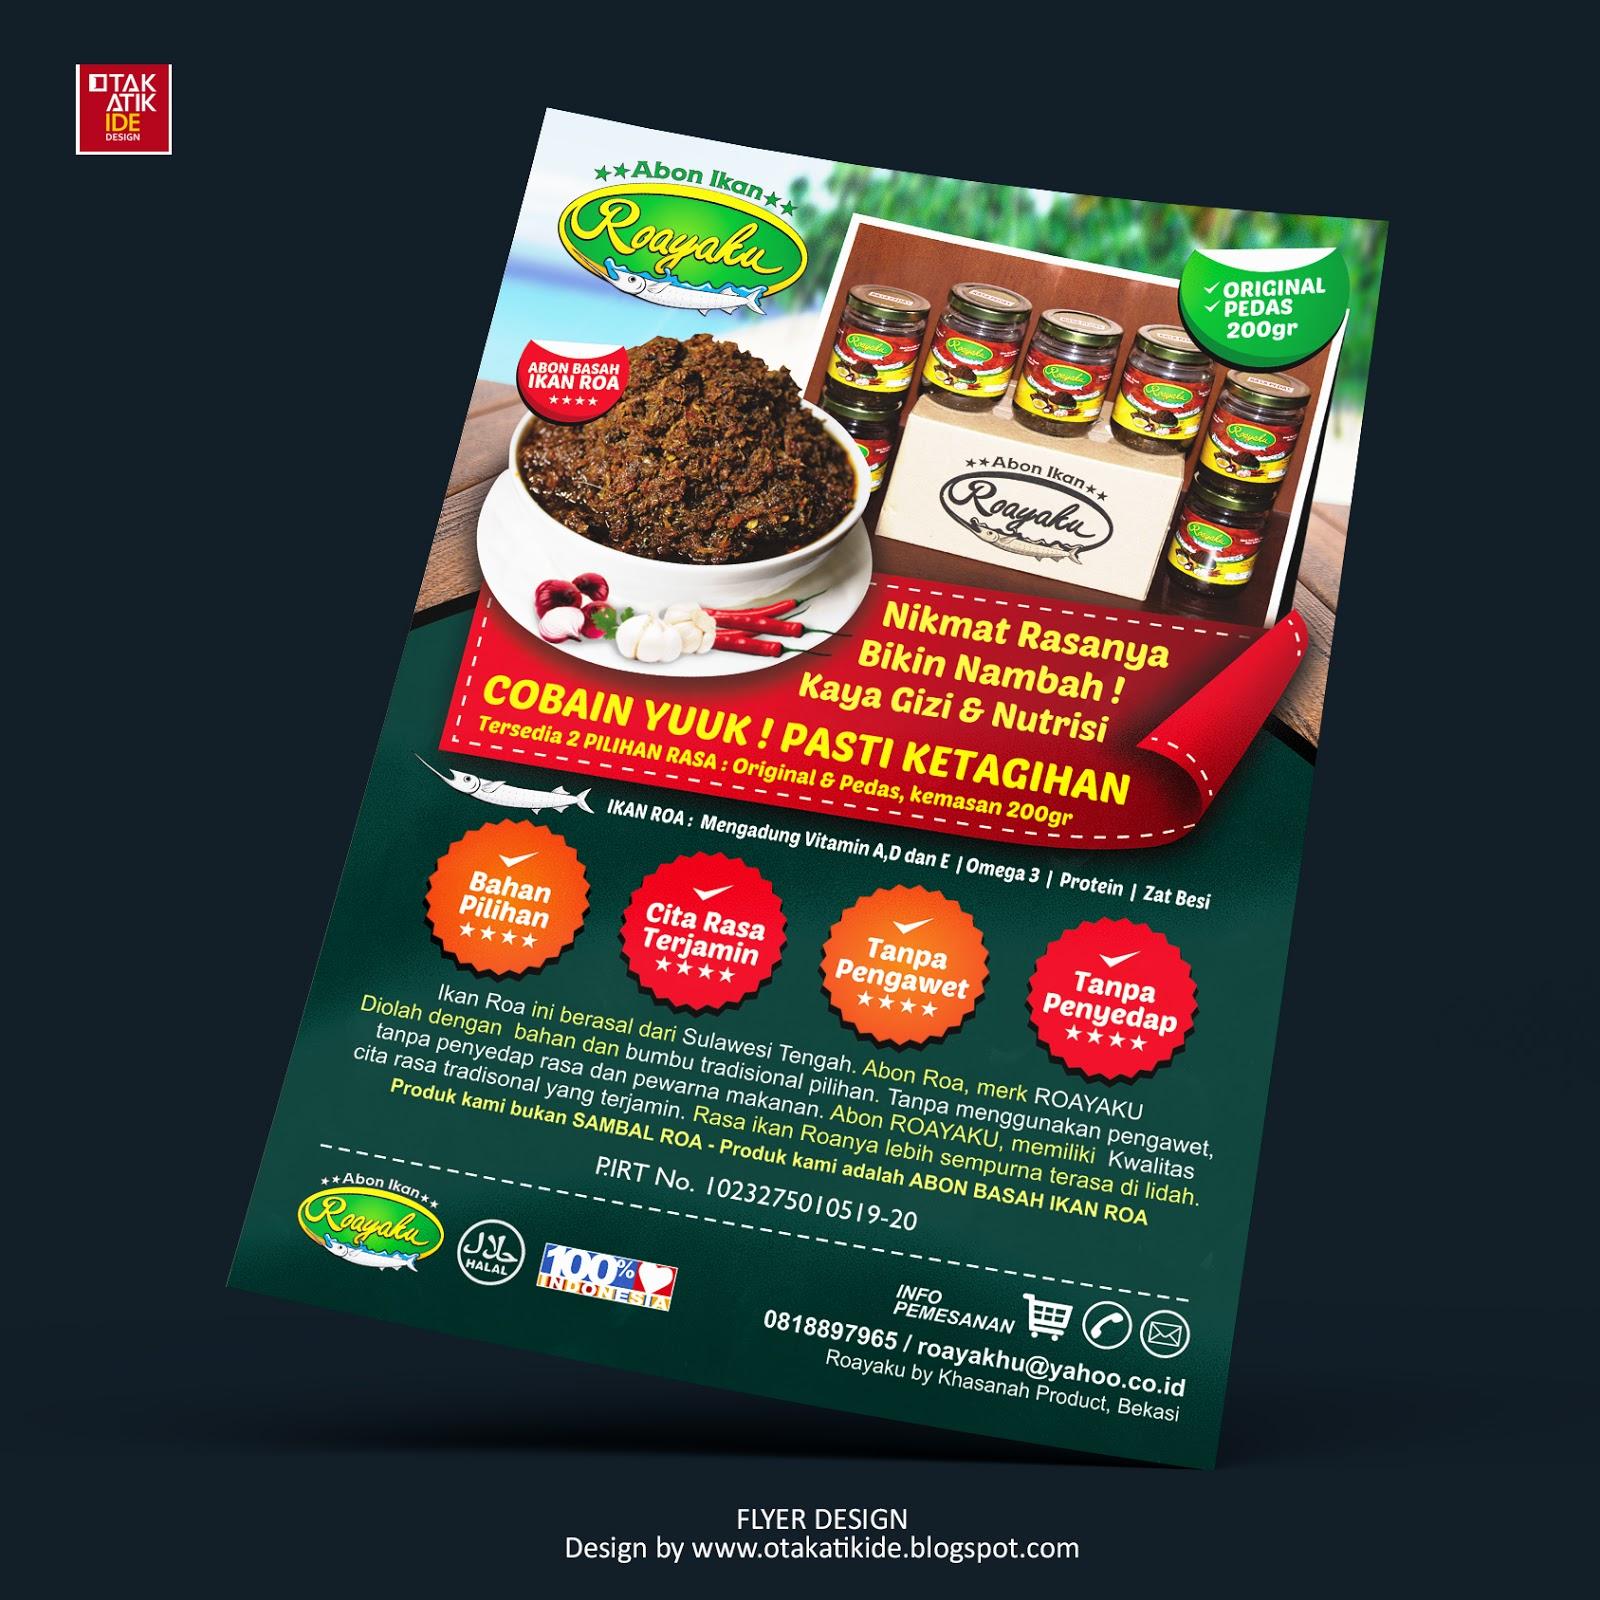 Jasa Desain Brosur Promosi Otakatikide Jasa Desain Logo Jasa Desain Branding Kemasan Desain Promosi Ukm